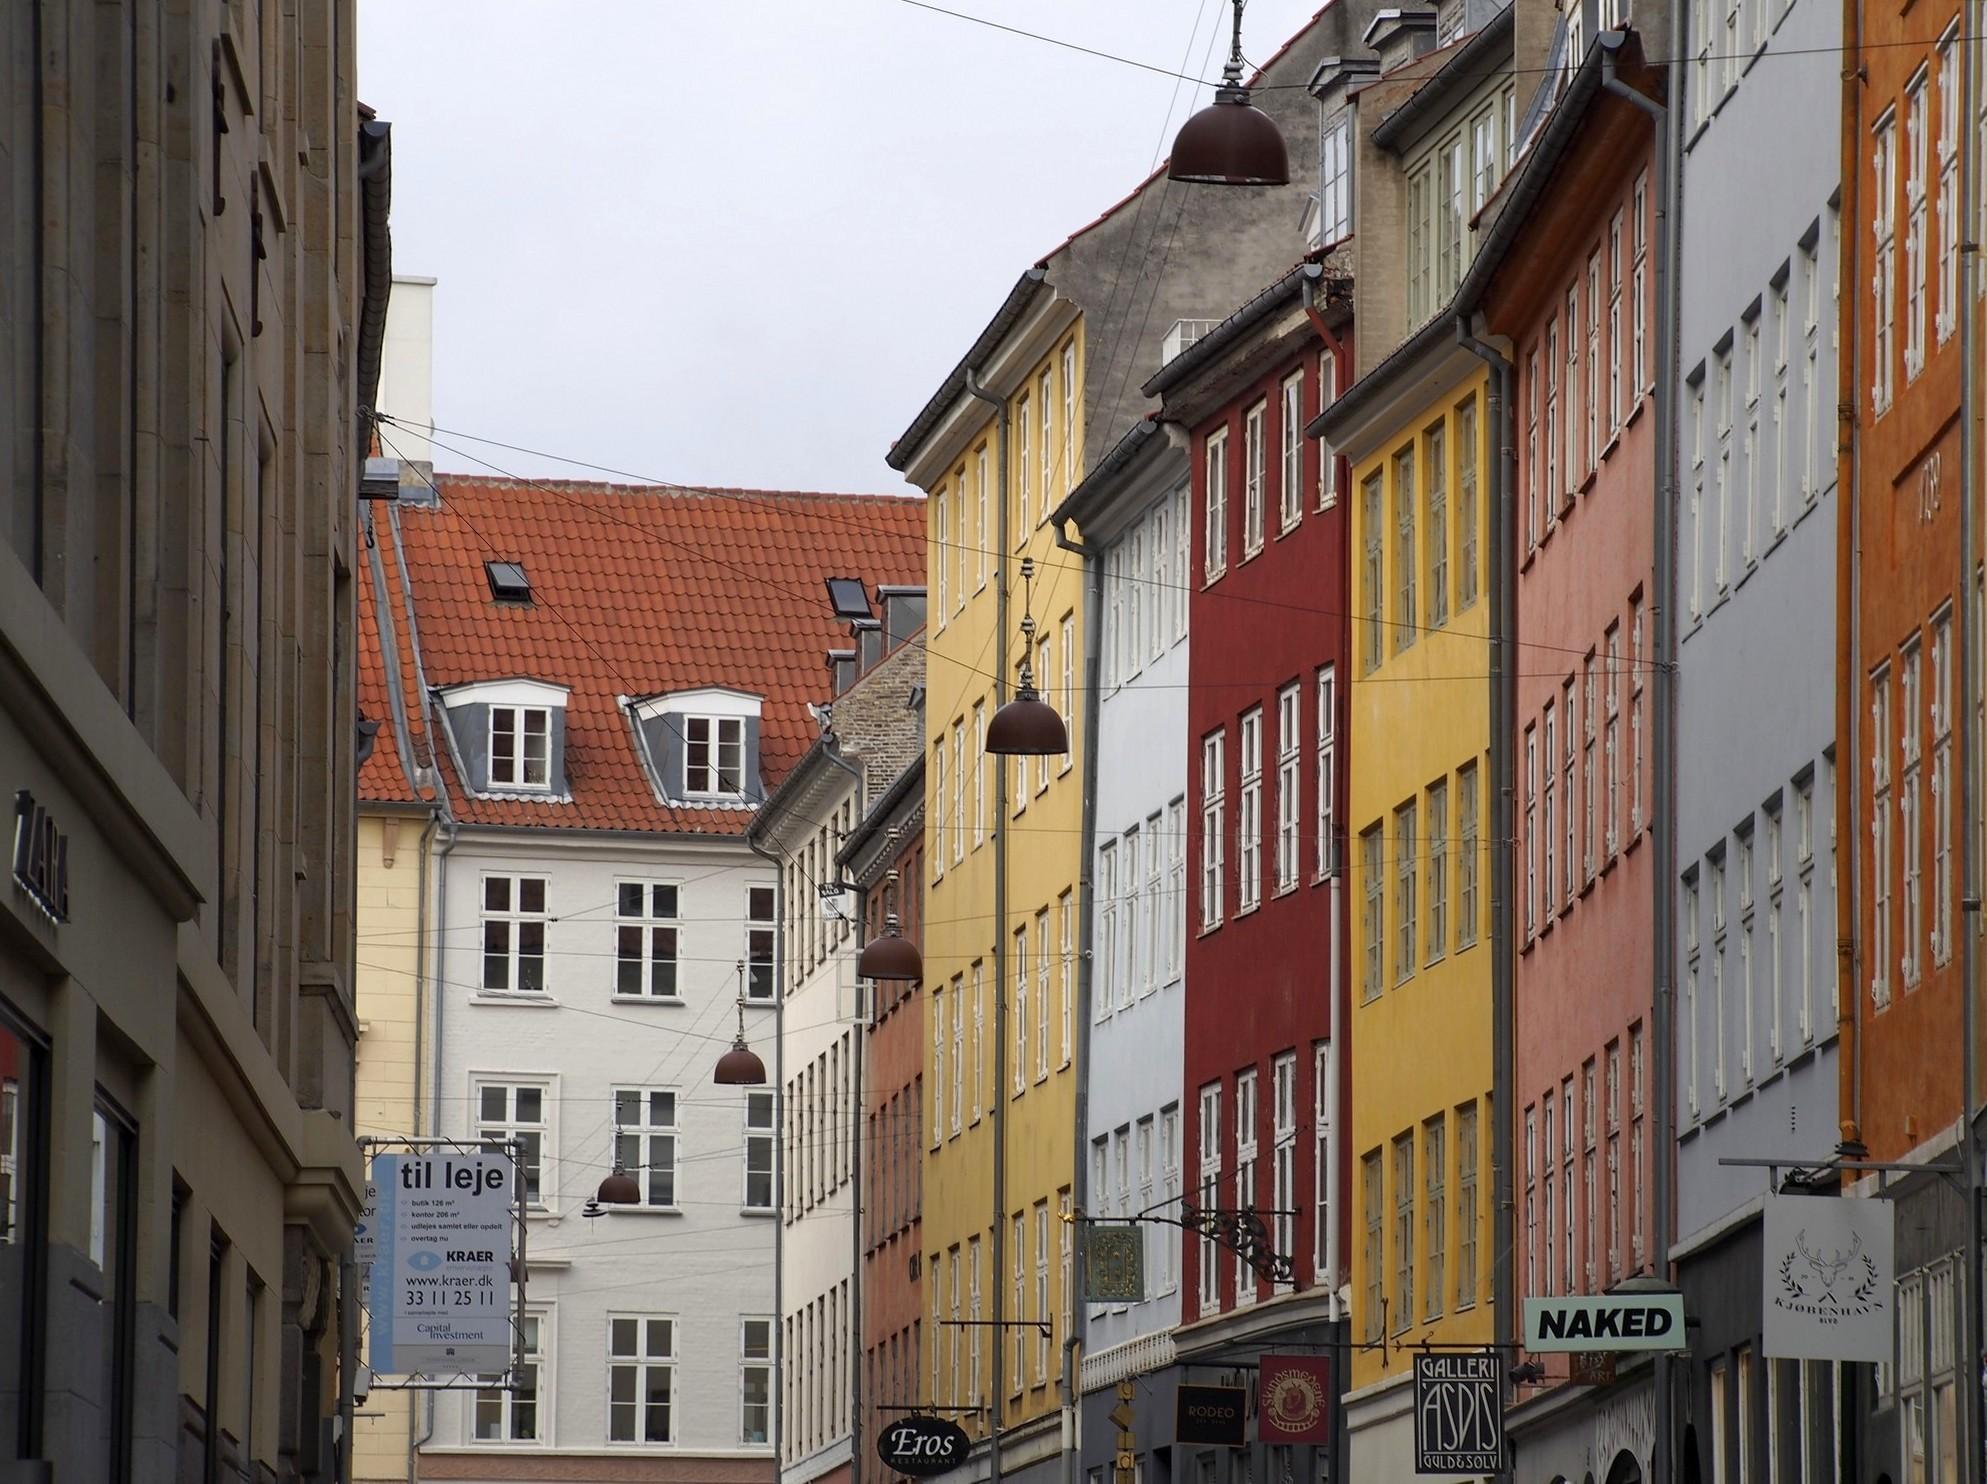 Malmö, Gamla staden